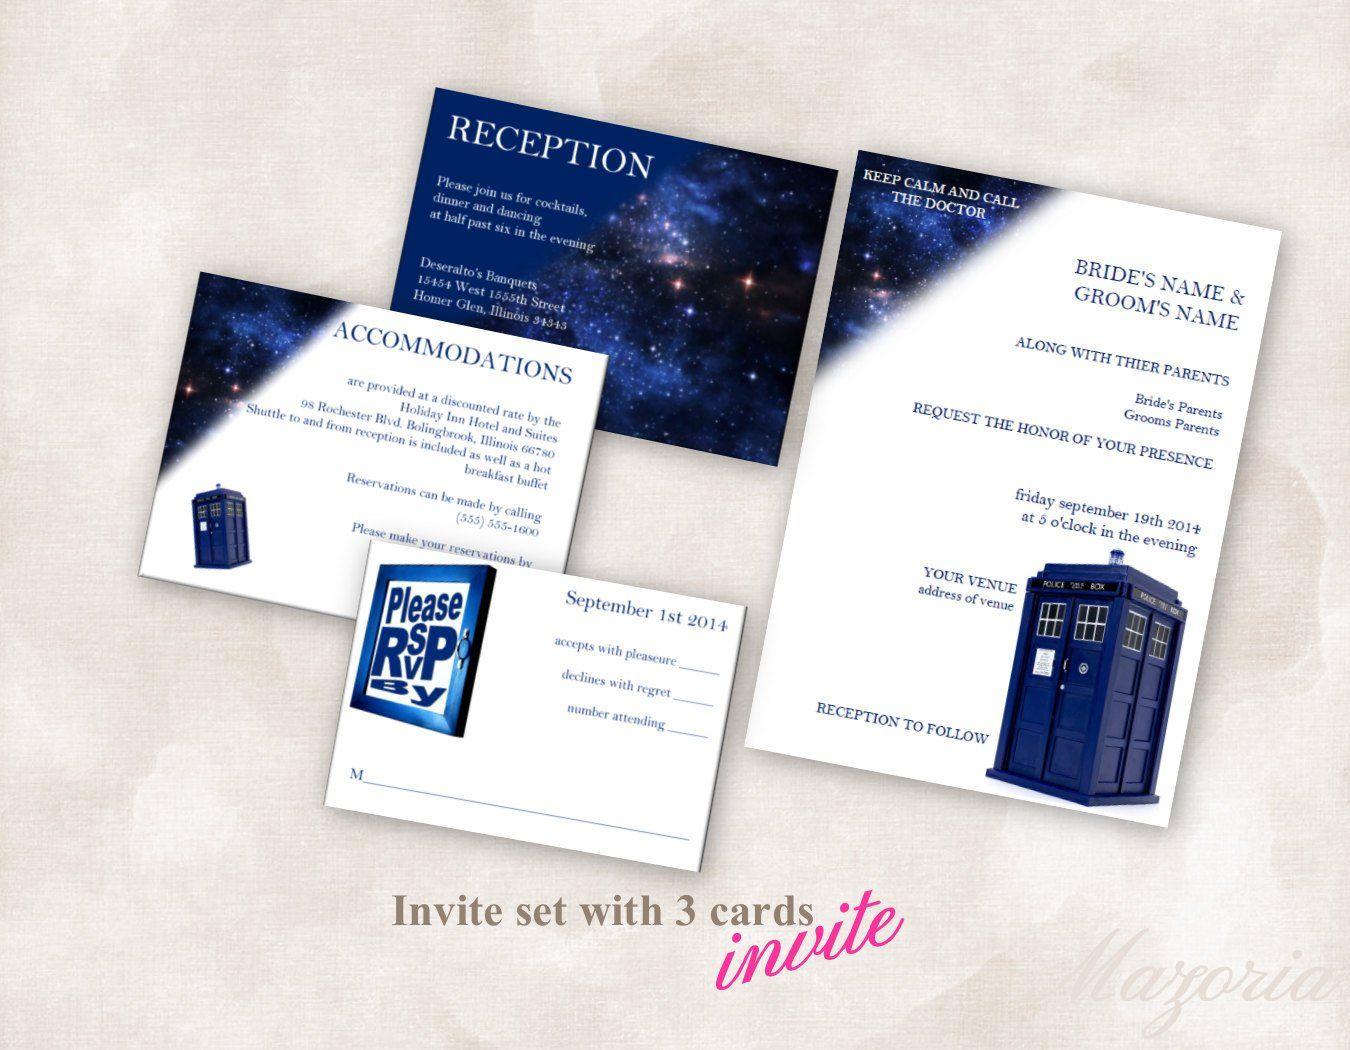 Editable Doctor Who Wedding Invitation Color tardis blue  Etsy